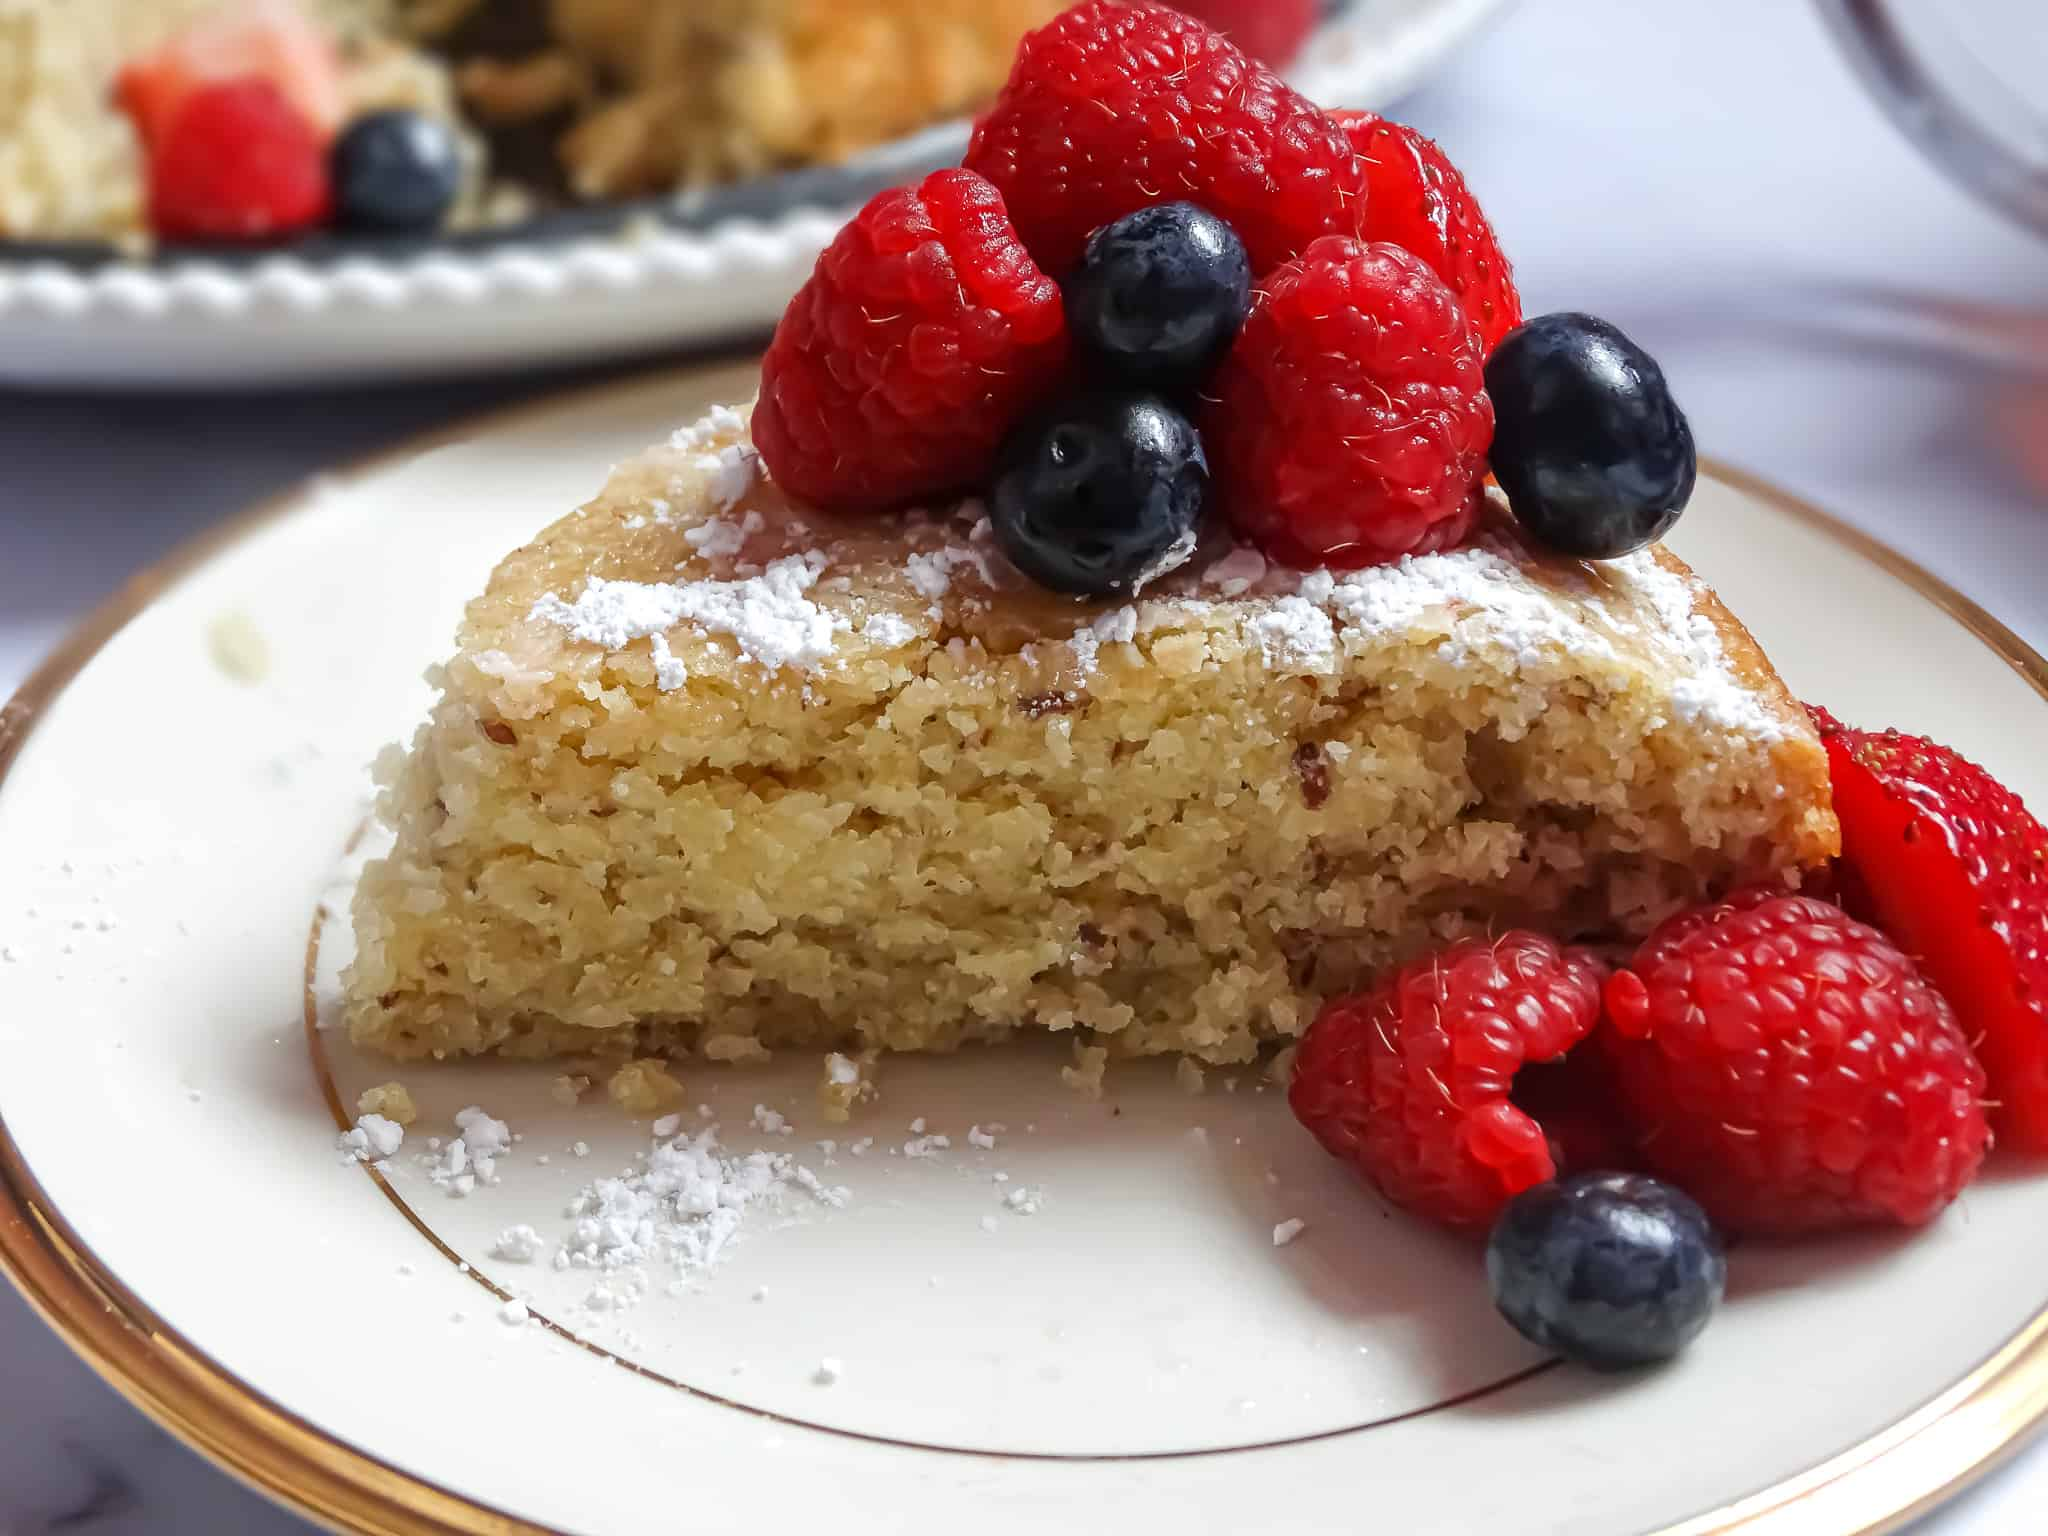 lemon olive oil cake topped with fruit